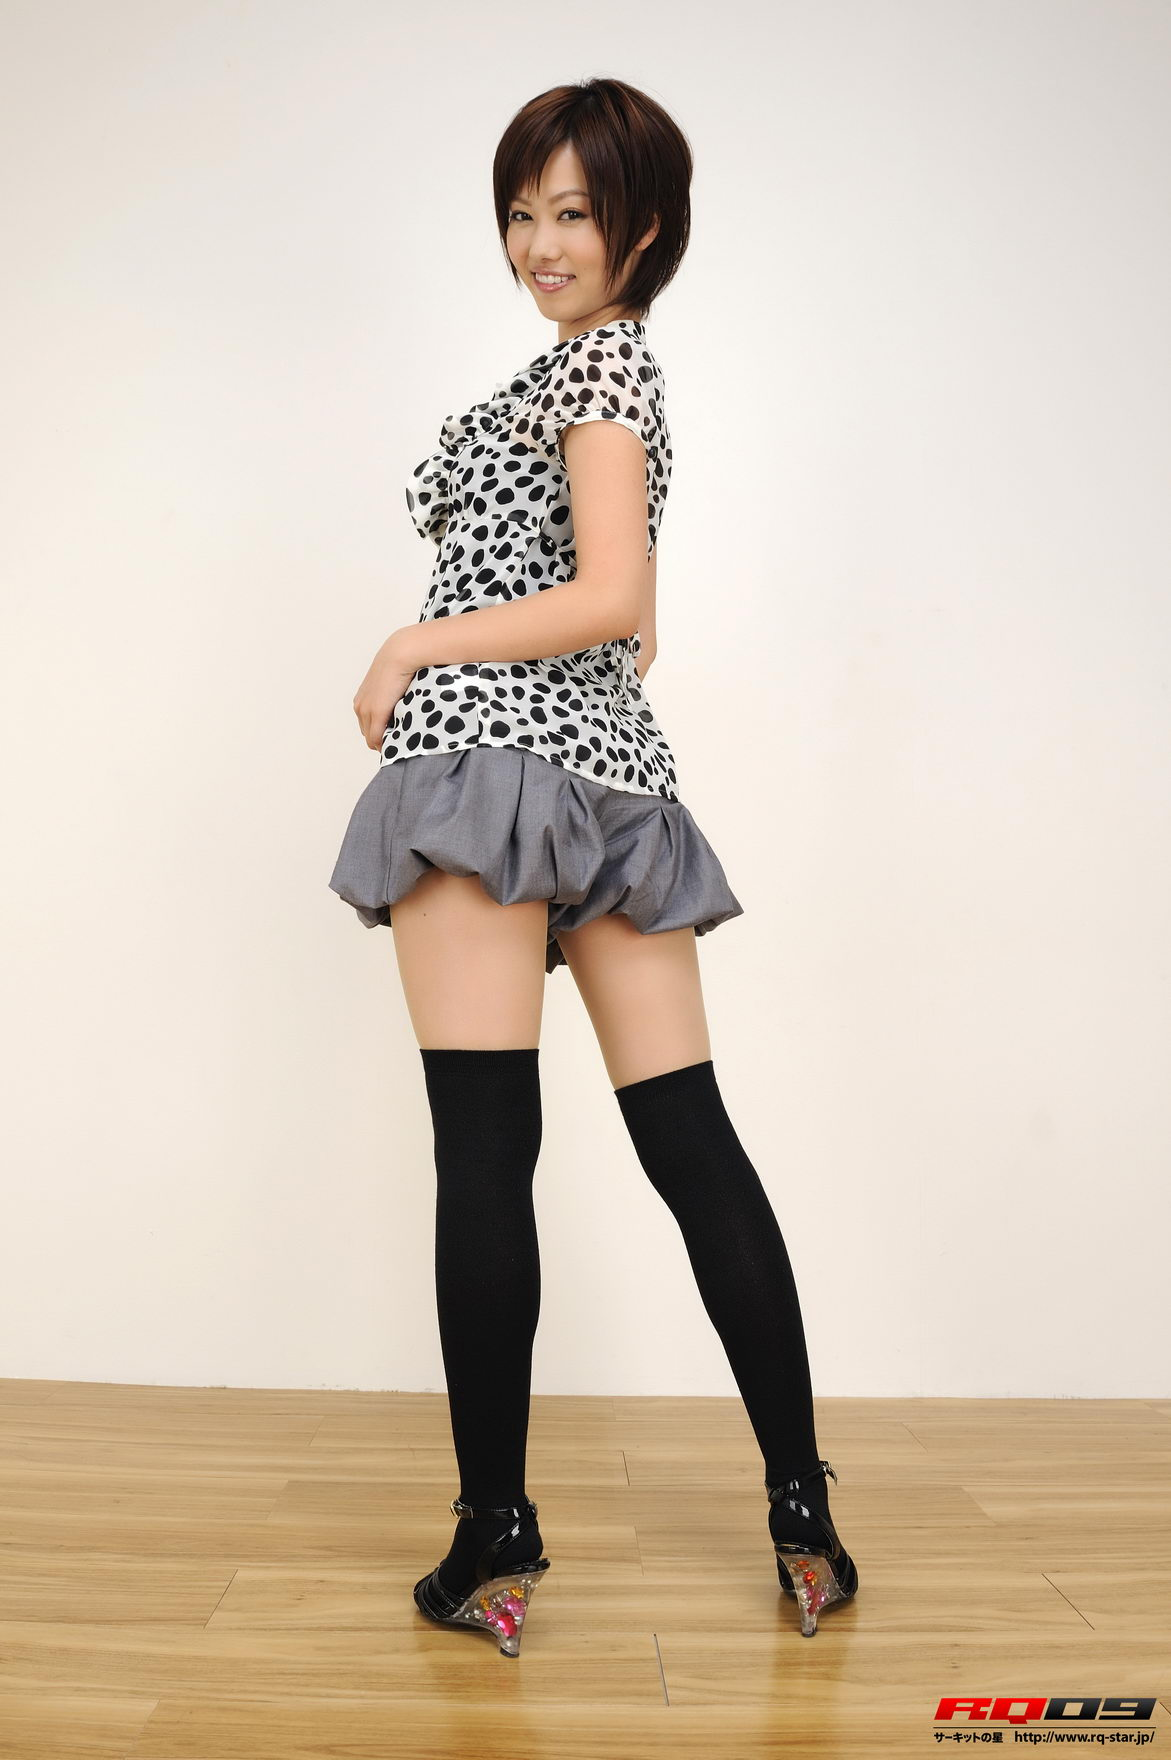 Main pictures gallery of emiri fujimura private dress next picture